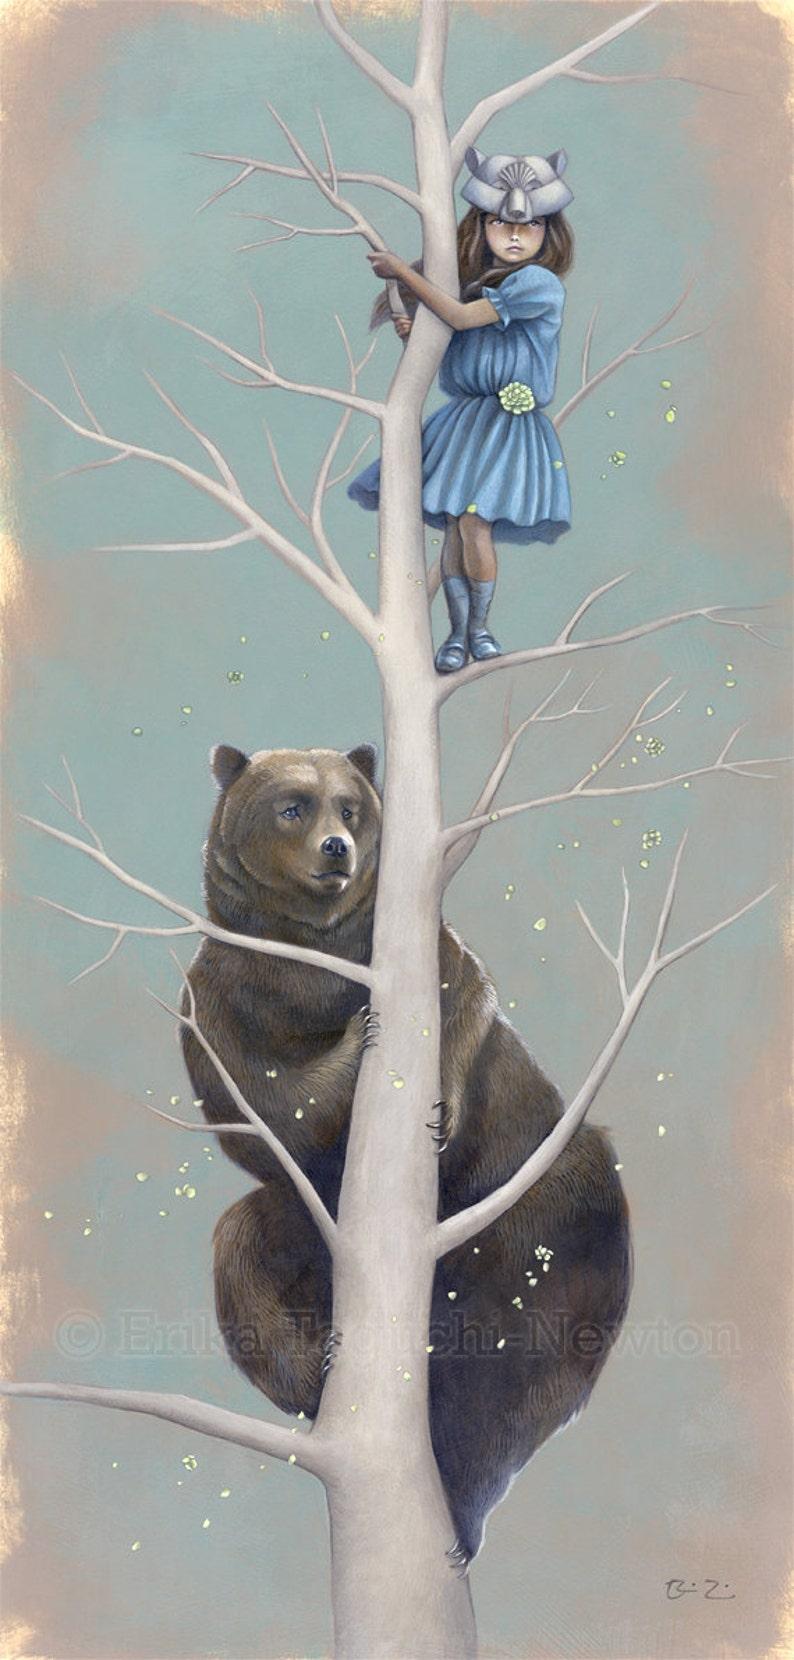 Girl Climbing Tree Art Brown Bear 9x18 Fine Art Print Mask image 0